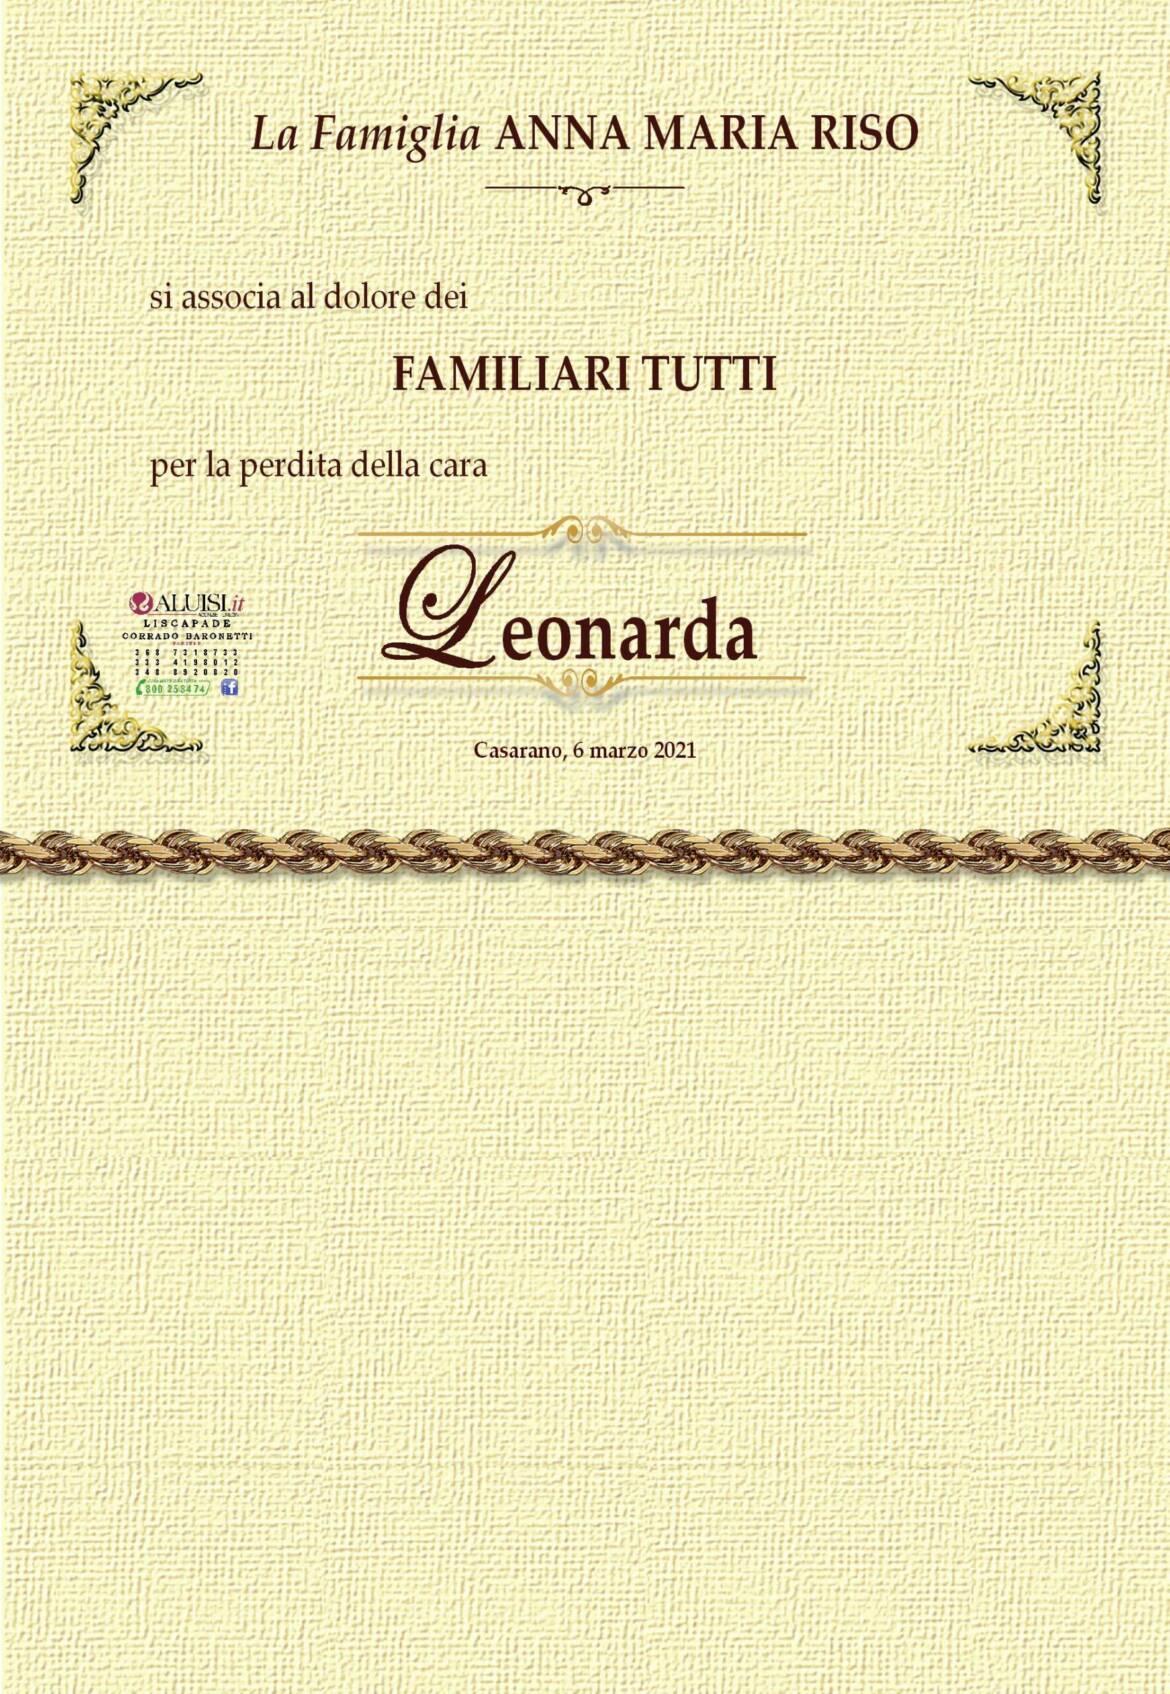 PARTECIPAZIONI-Leonarda-Padovano-Casarano-scaled.jpg